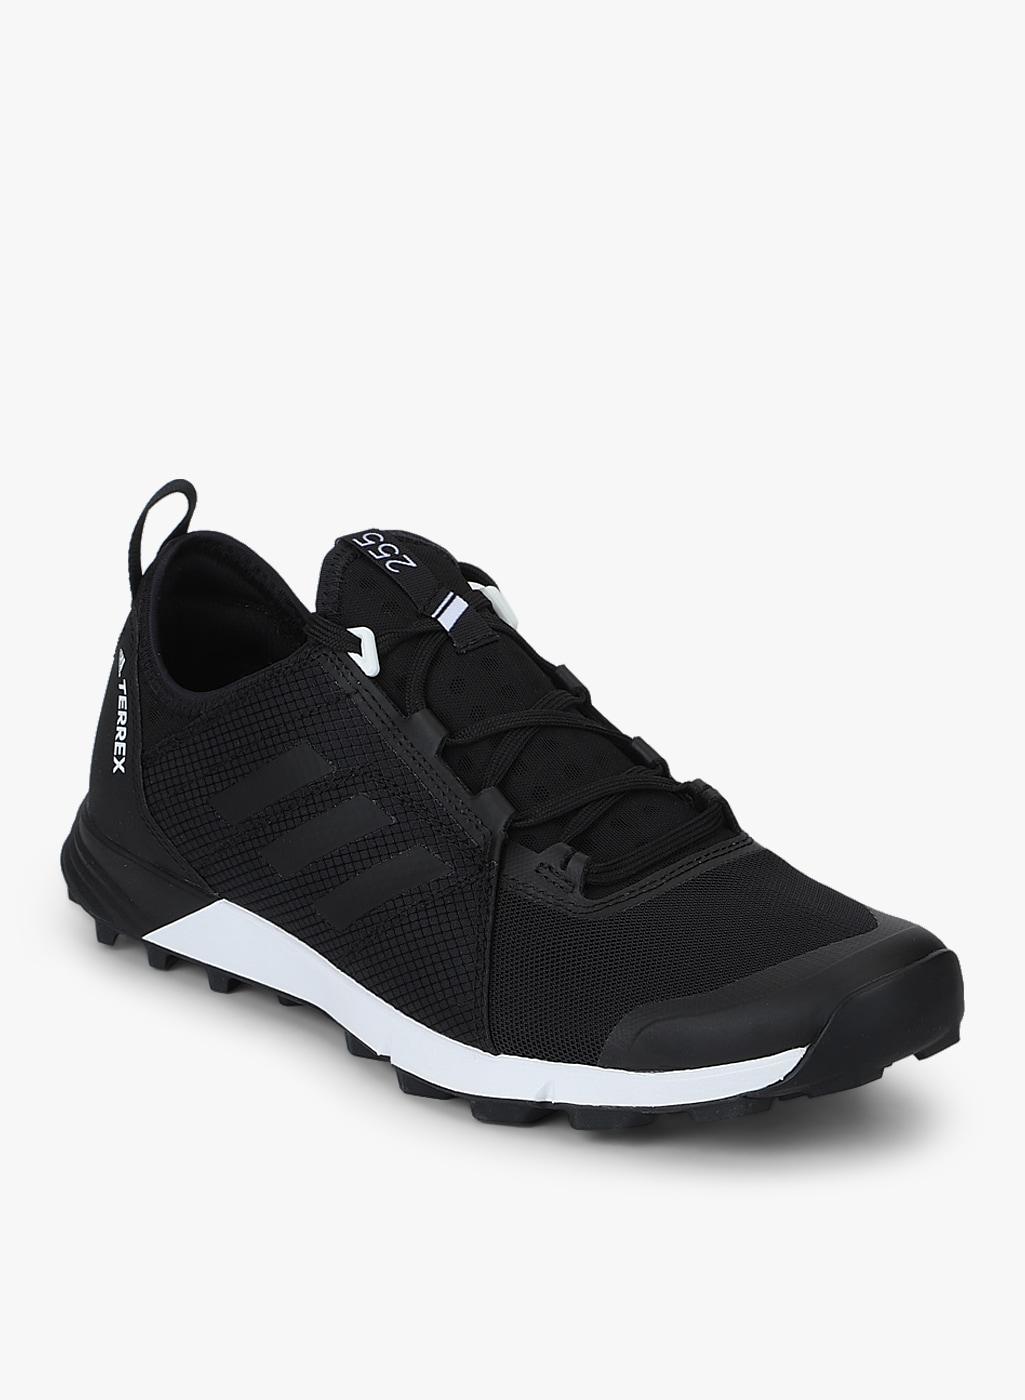 23f4debc Trek Casual Shoes - Buy Trek Casual Shoes online in India